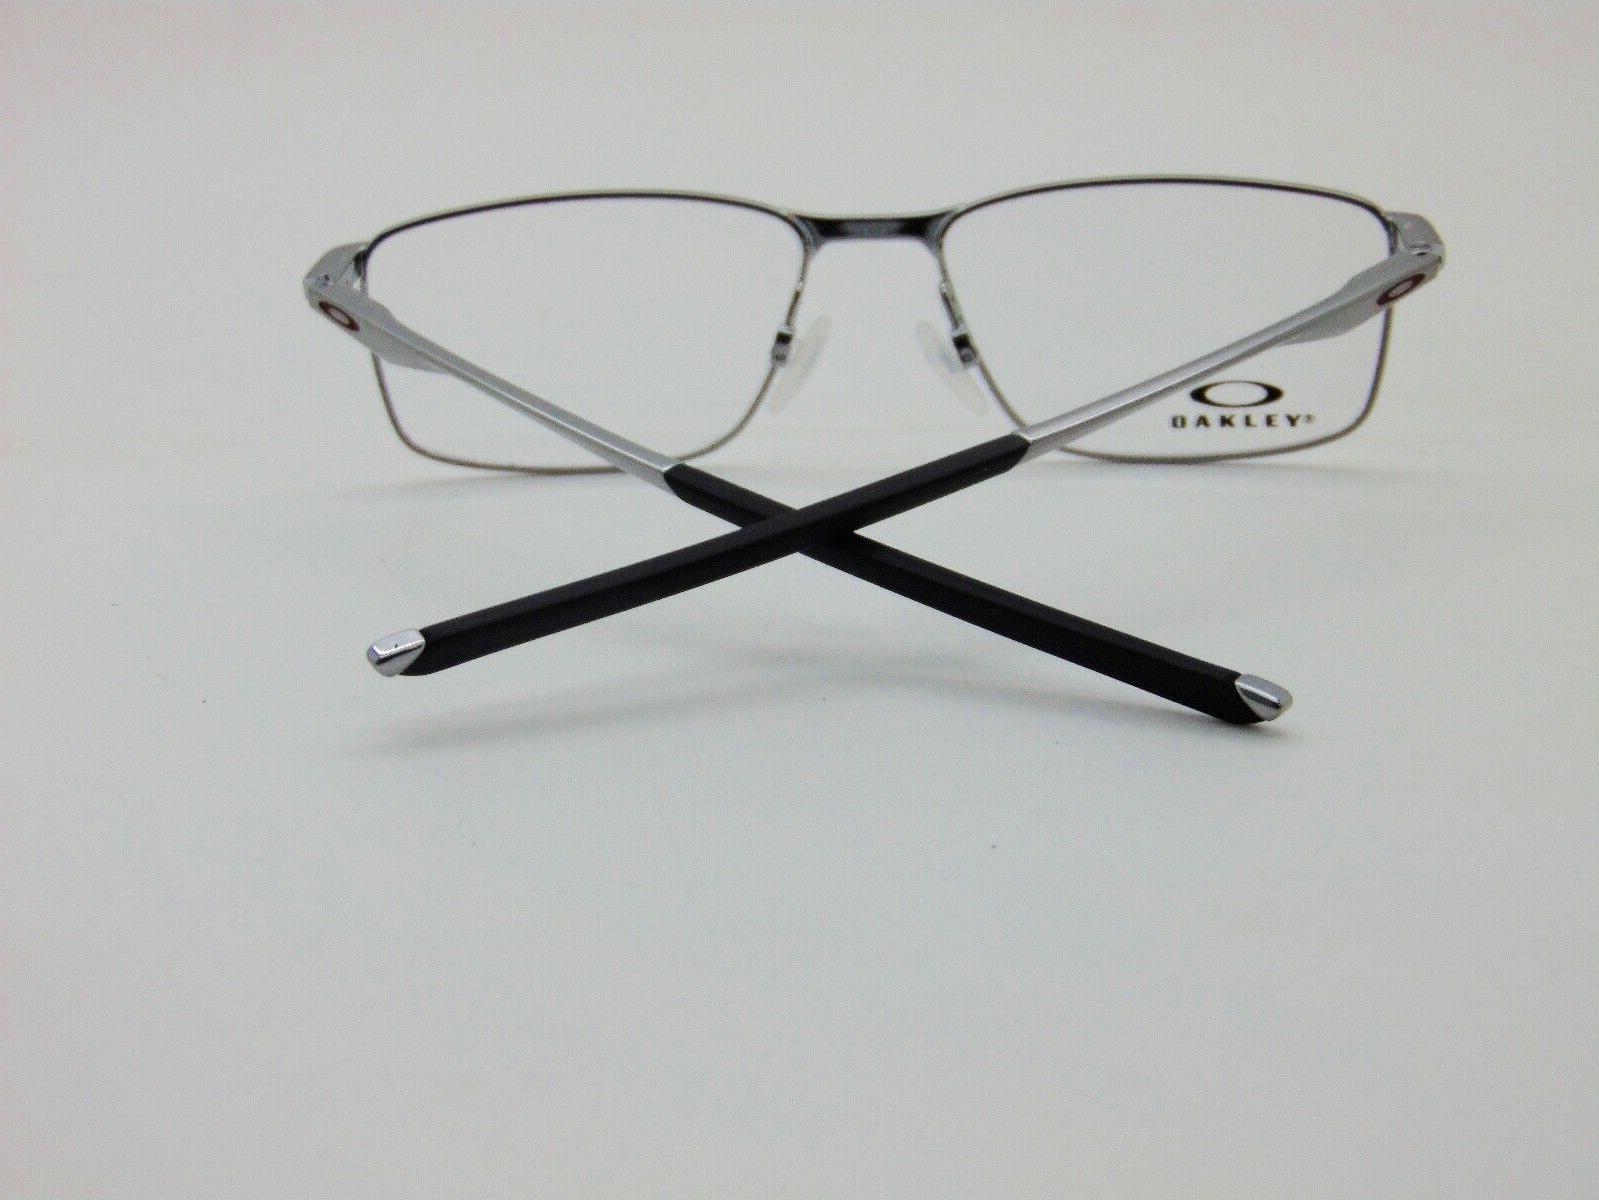 OAKLEY Gunmetal/Cardinal 55mm Eyeglasses